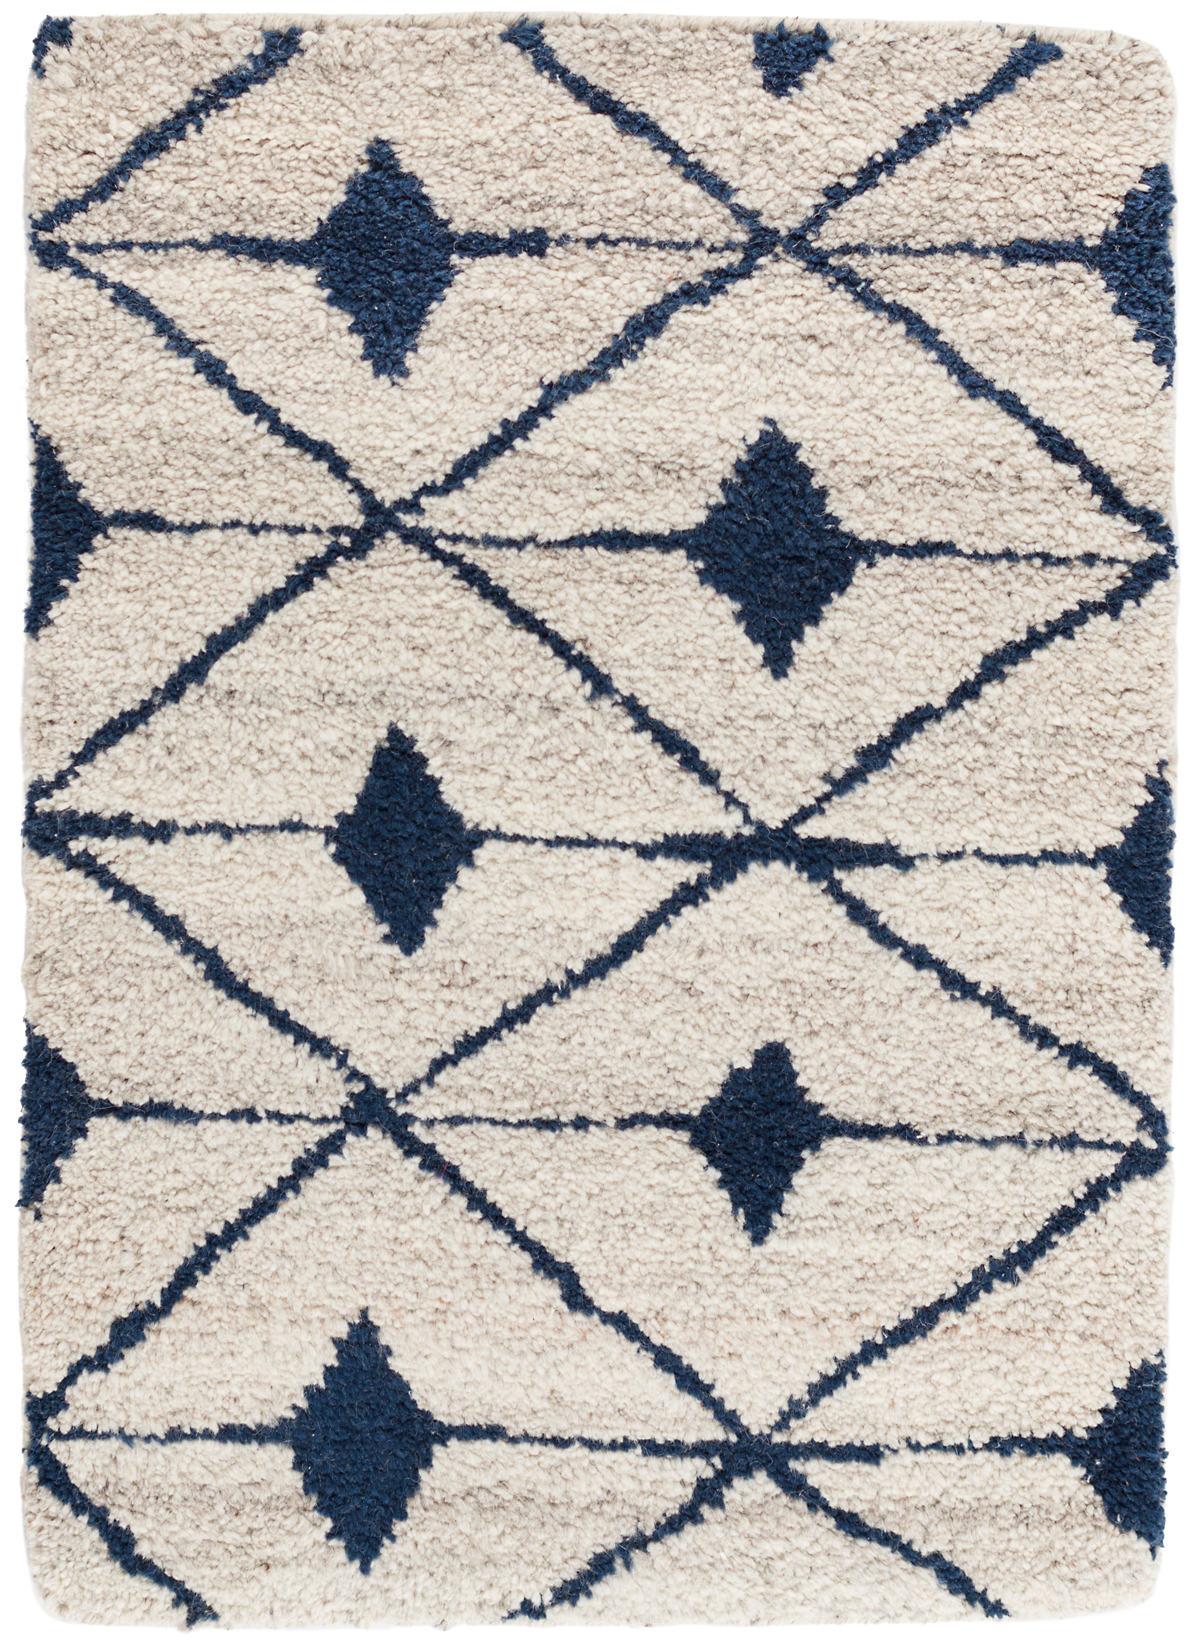 Kenitra Indigo Hand Knotted Wool Rug